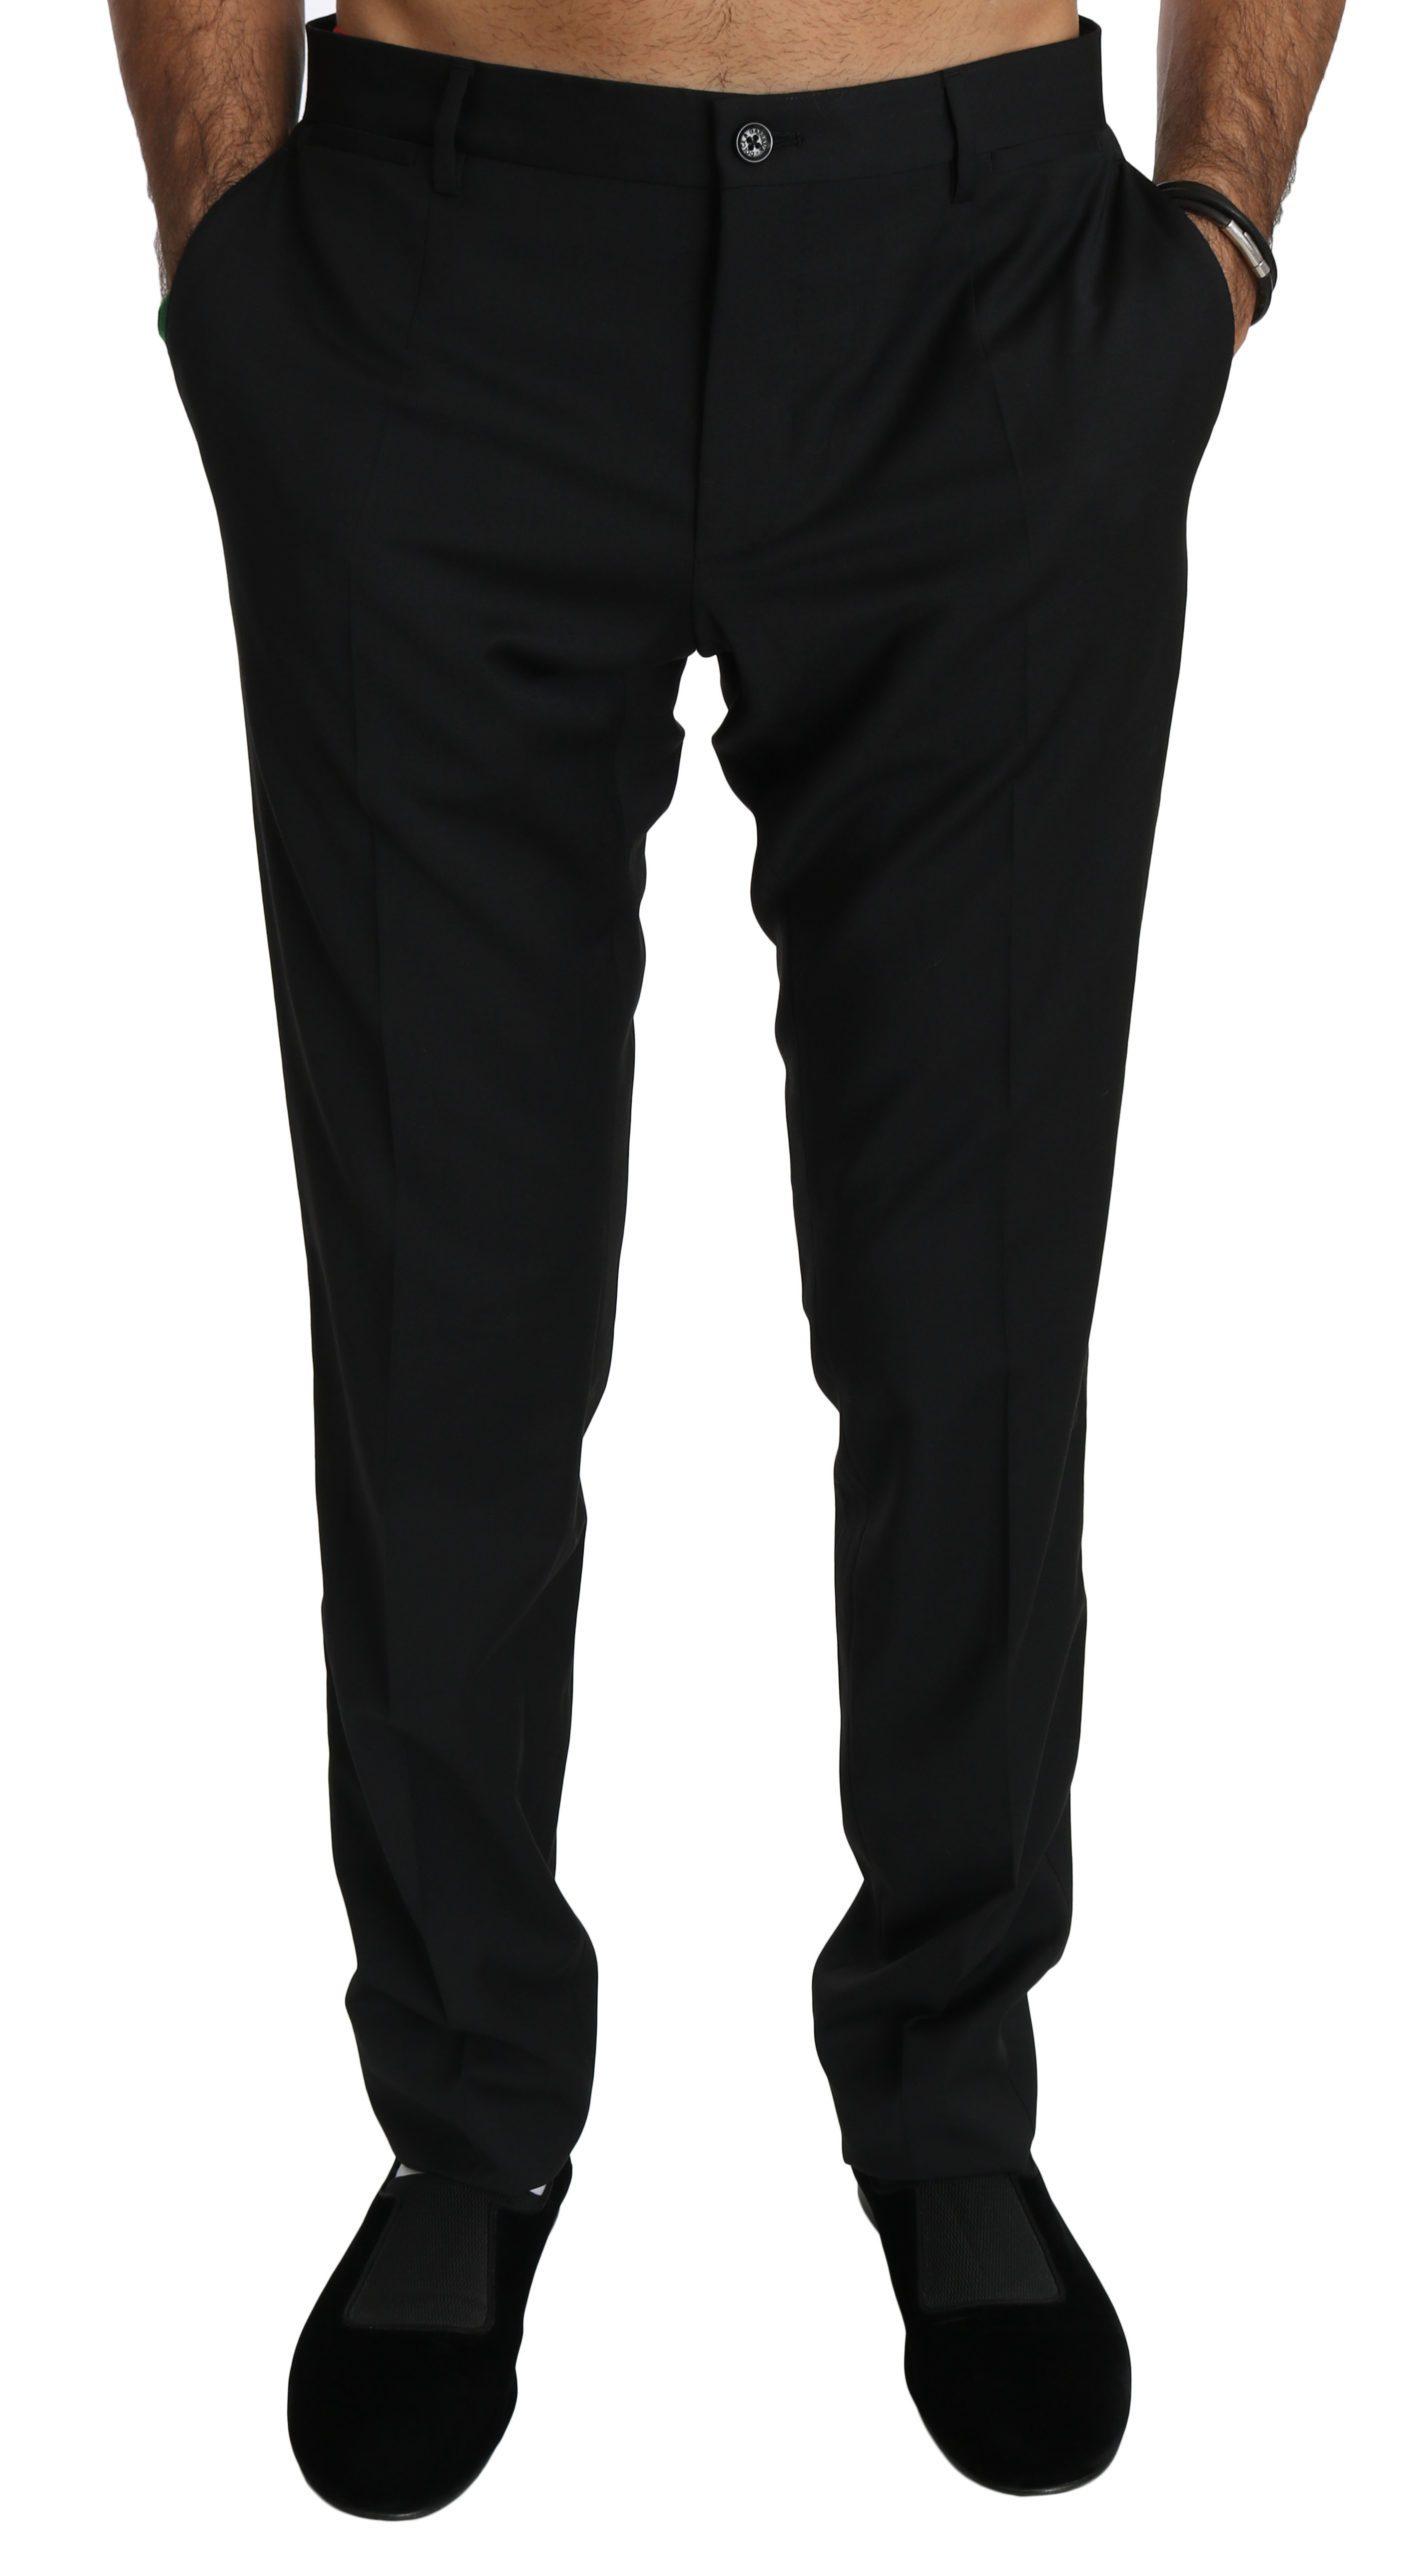 Dolce & Gabbana Men's Skinny Dress Wool Trouser Black PAN70760 - IT48   M